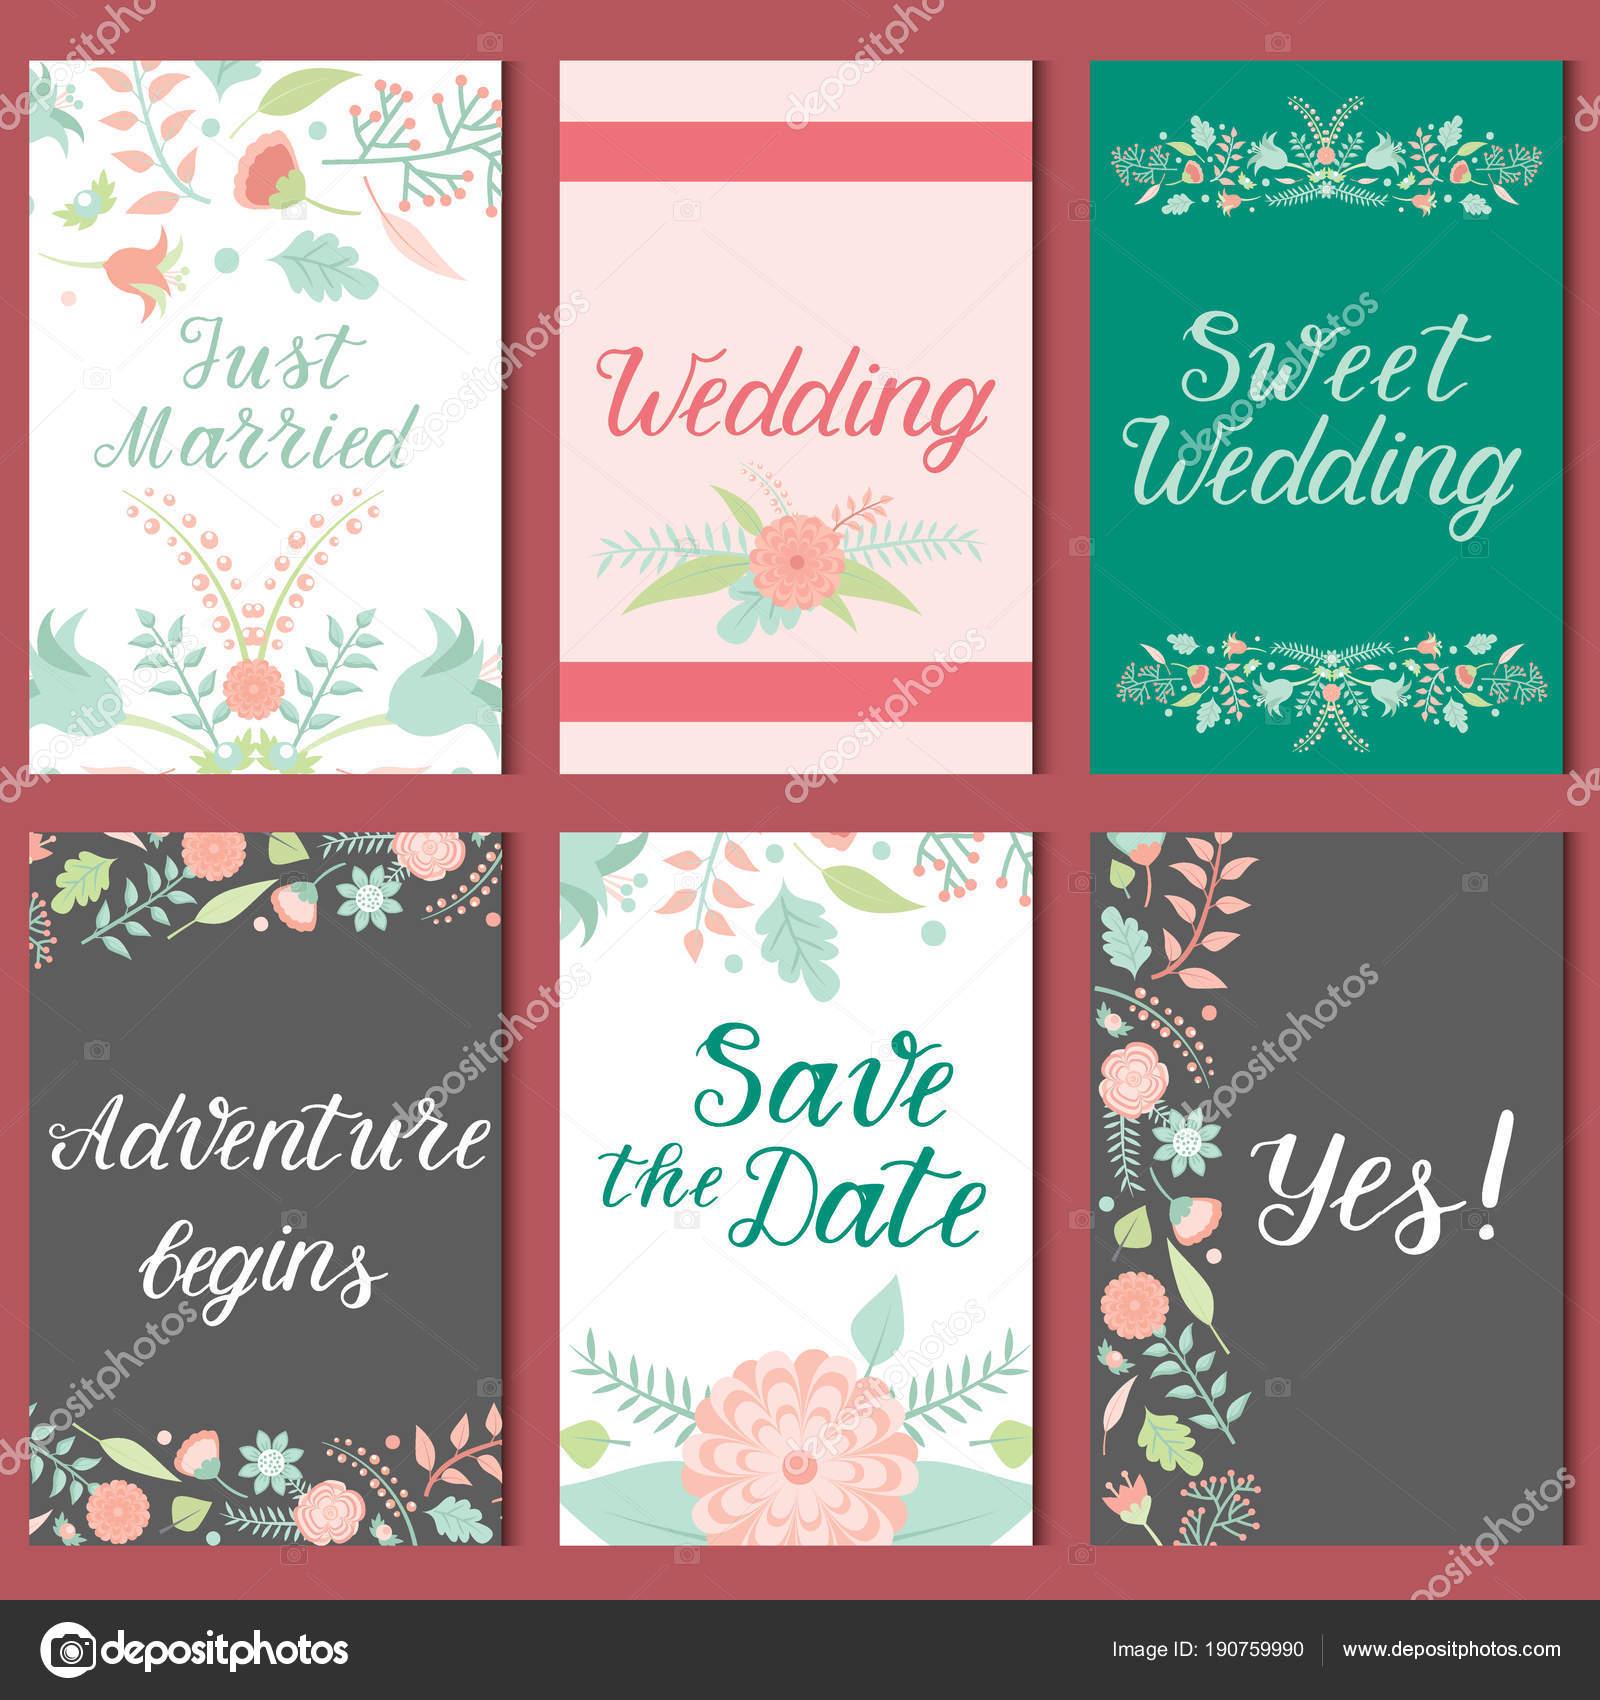 Wedding invitation card vector save the date suite with flower wedding invitation card vector save the date suite with flower templates day marriage handmade lettering print stopboris Choice Image